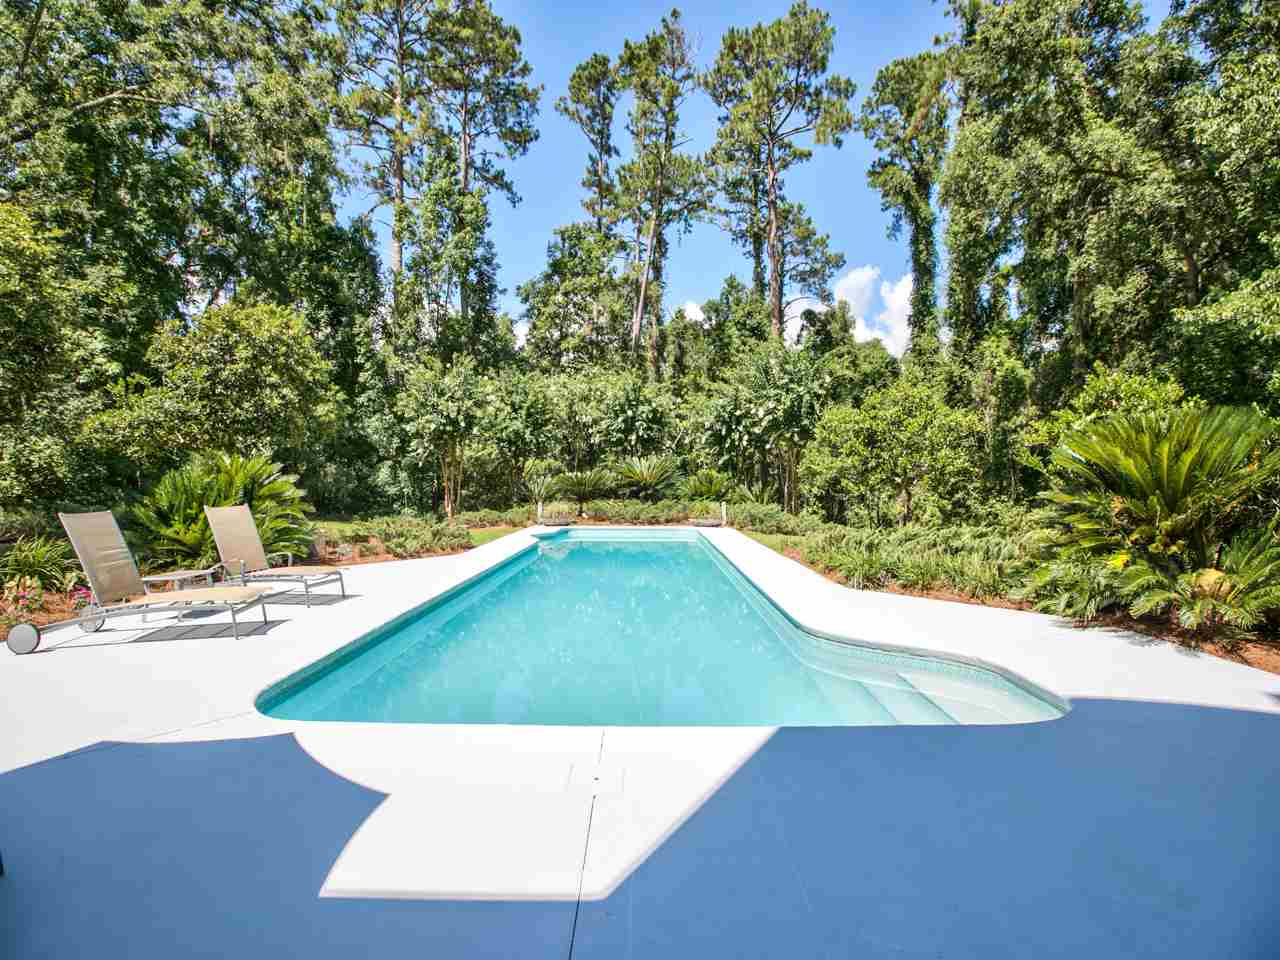 6096 Miller Landing Cove, Tallahassee, FL, 32312 - 6096